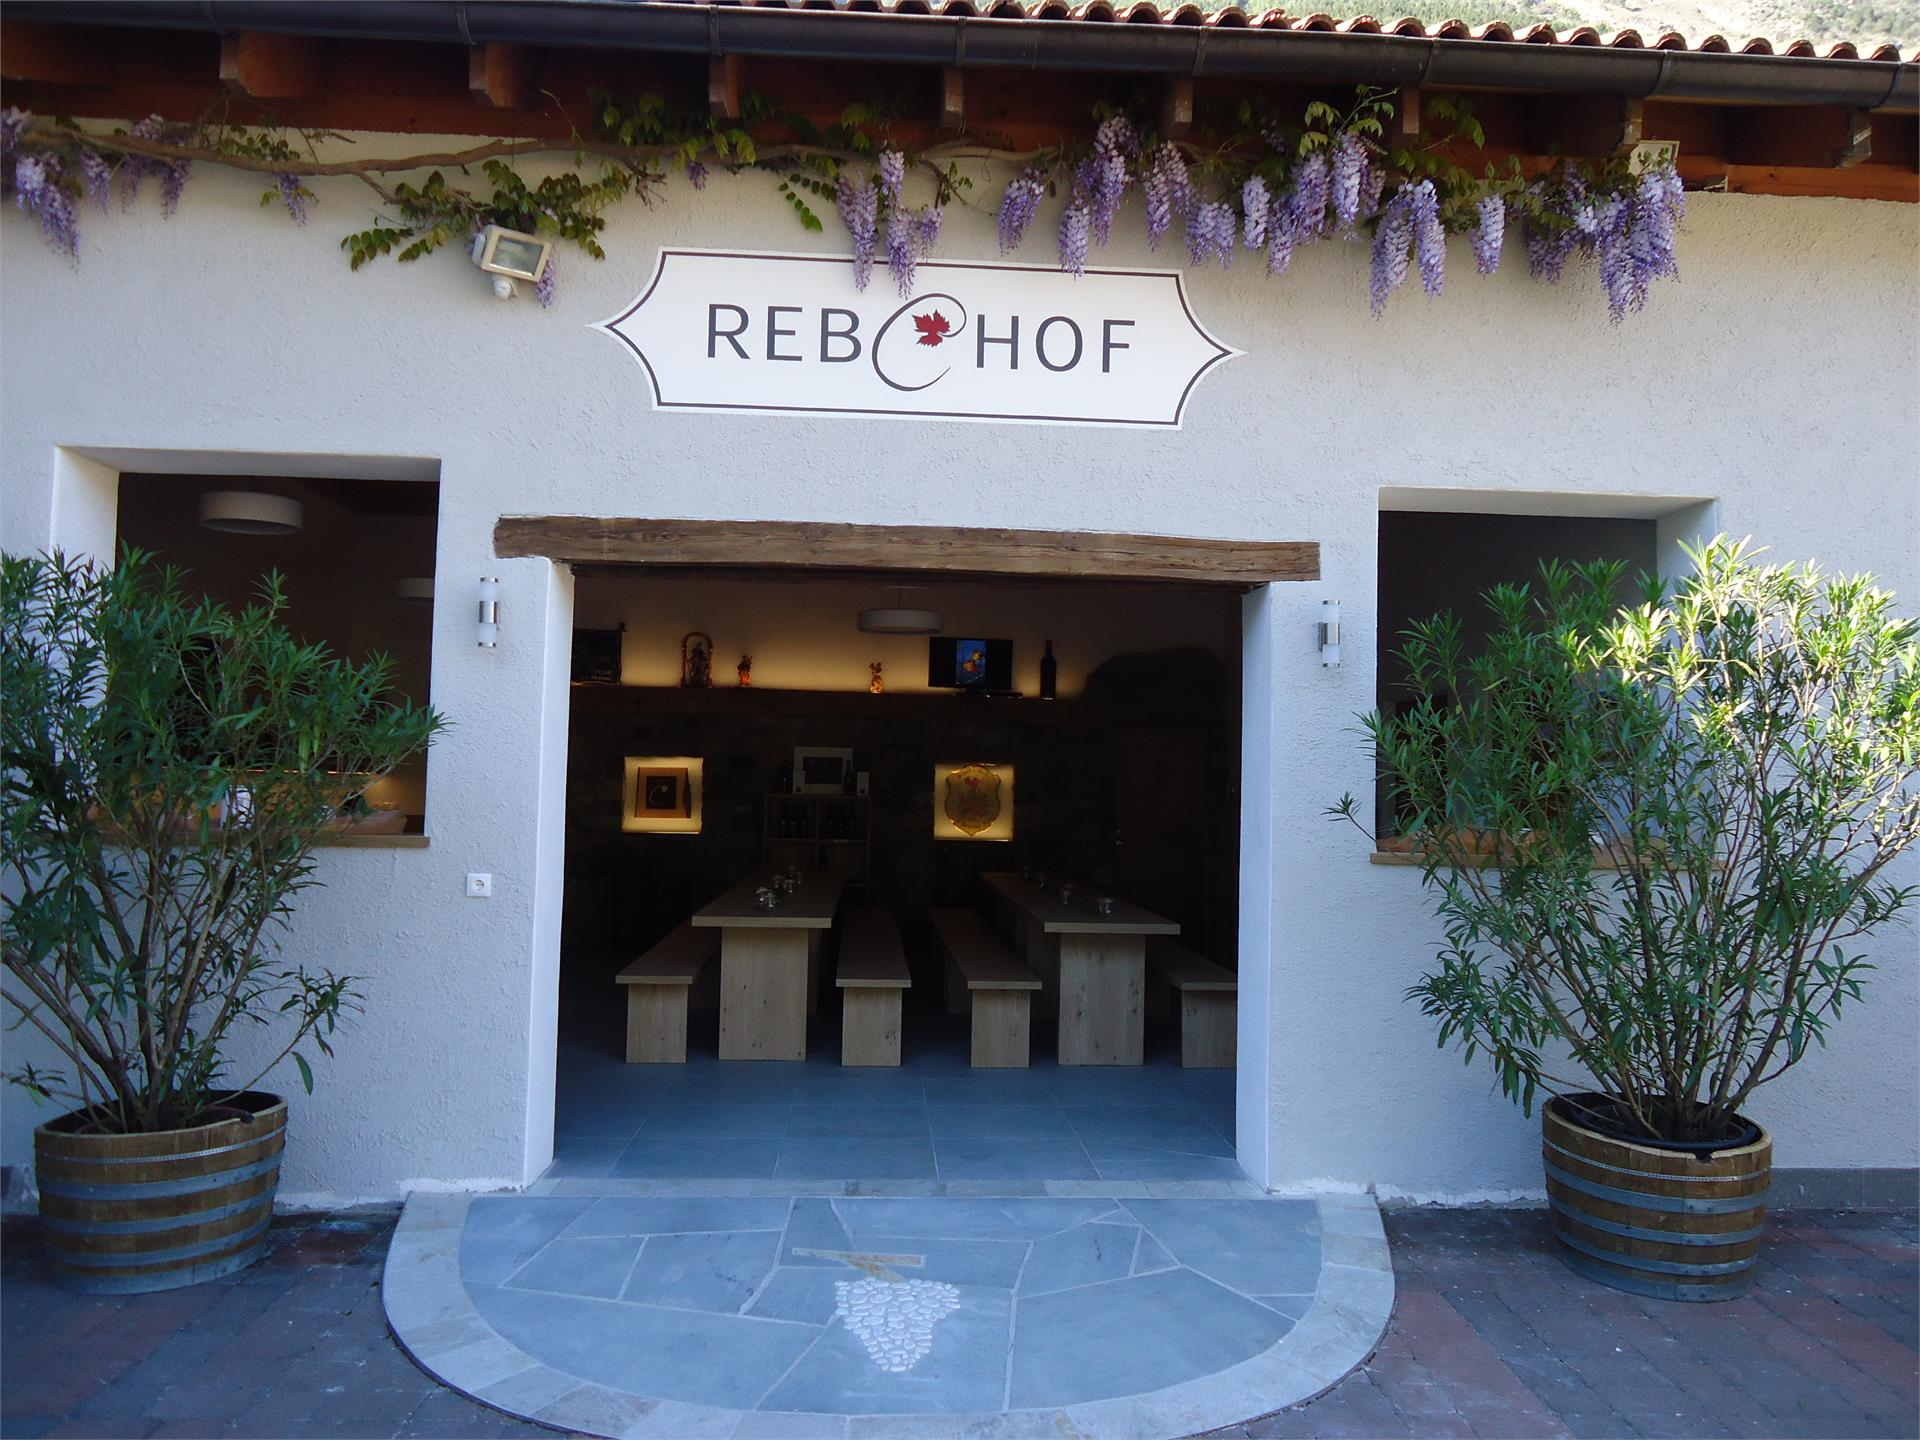 Azienda vinicola Rebhof